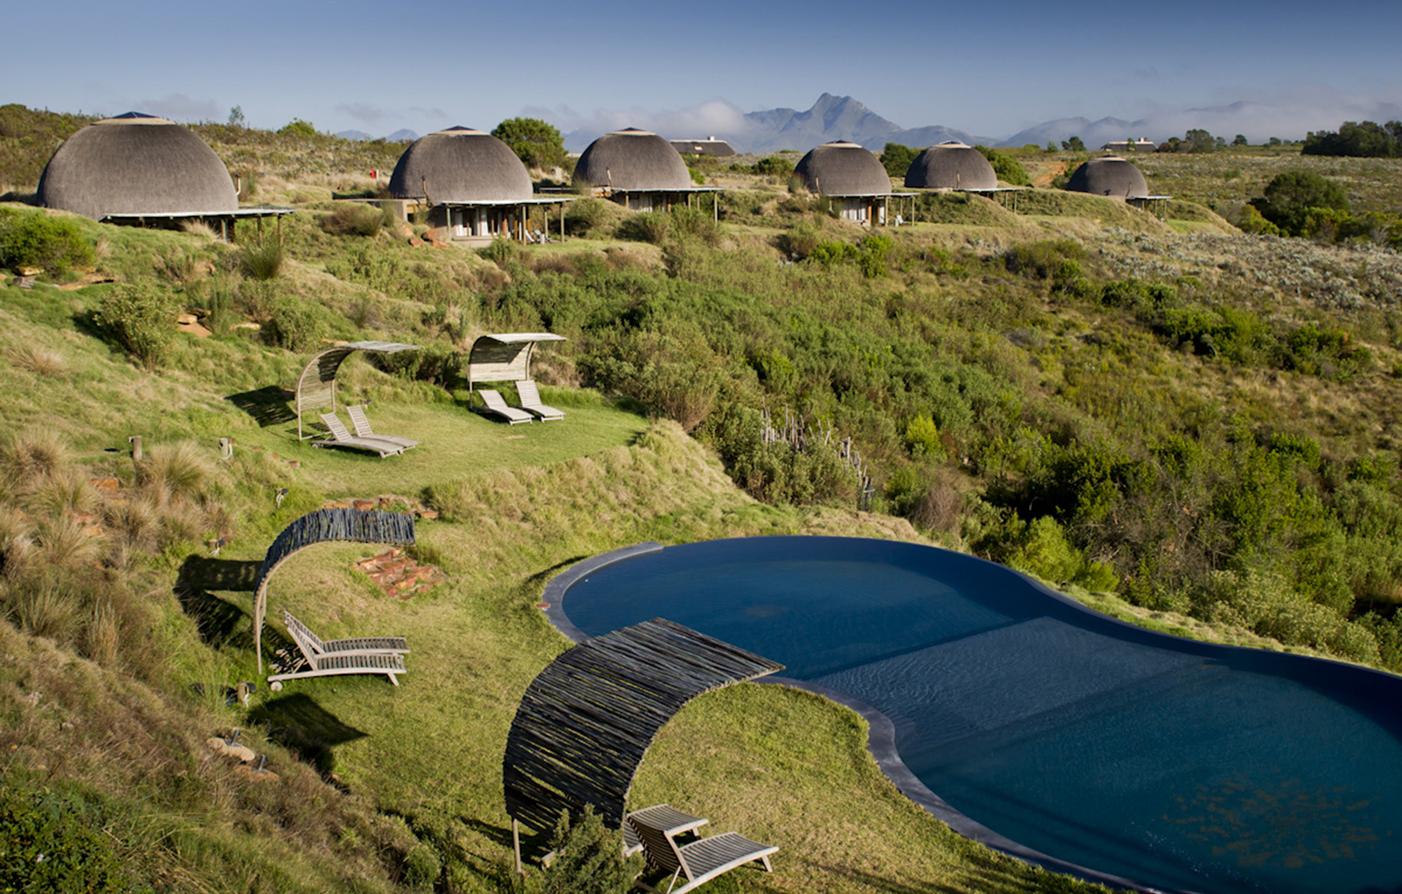 Gondwana Game Reserve - Huts & Pool